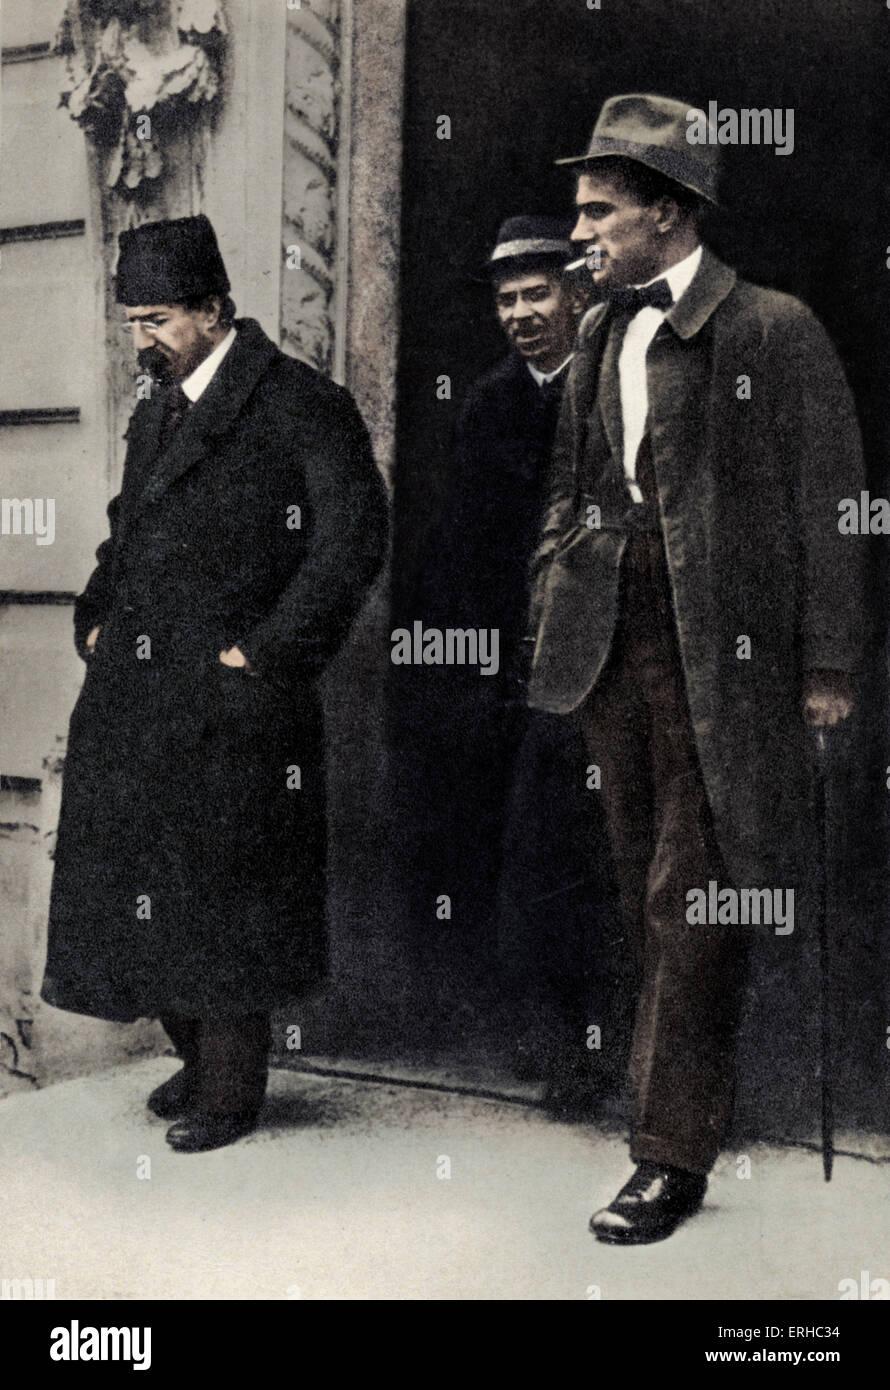 Soviet writer Vladimir Mayakovsky with education minister Anatoli Vasilevich Lunacharsky (left) - employed by Lenin - Stock Image